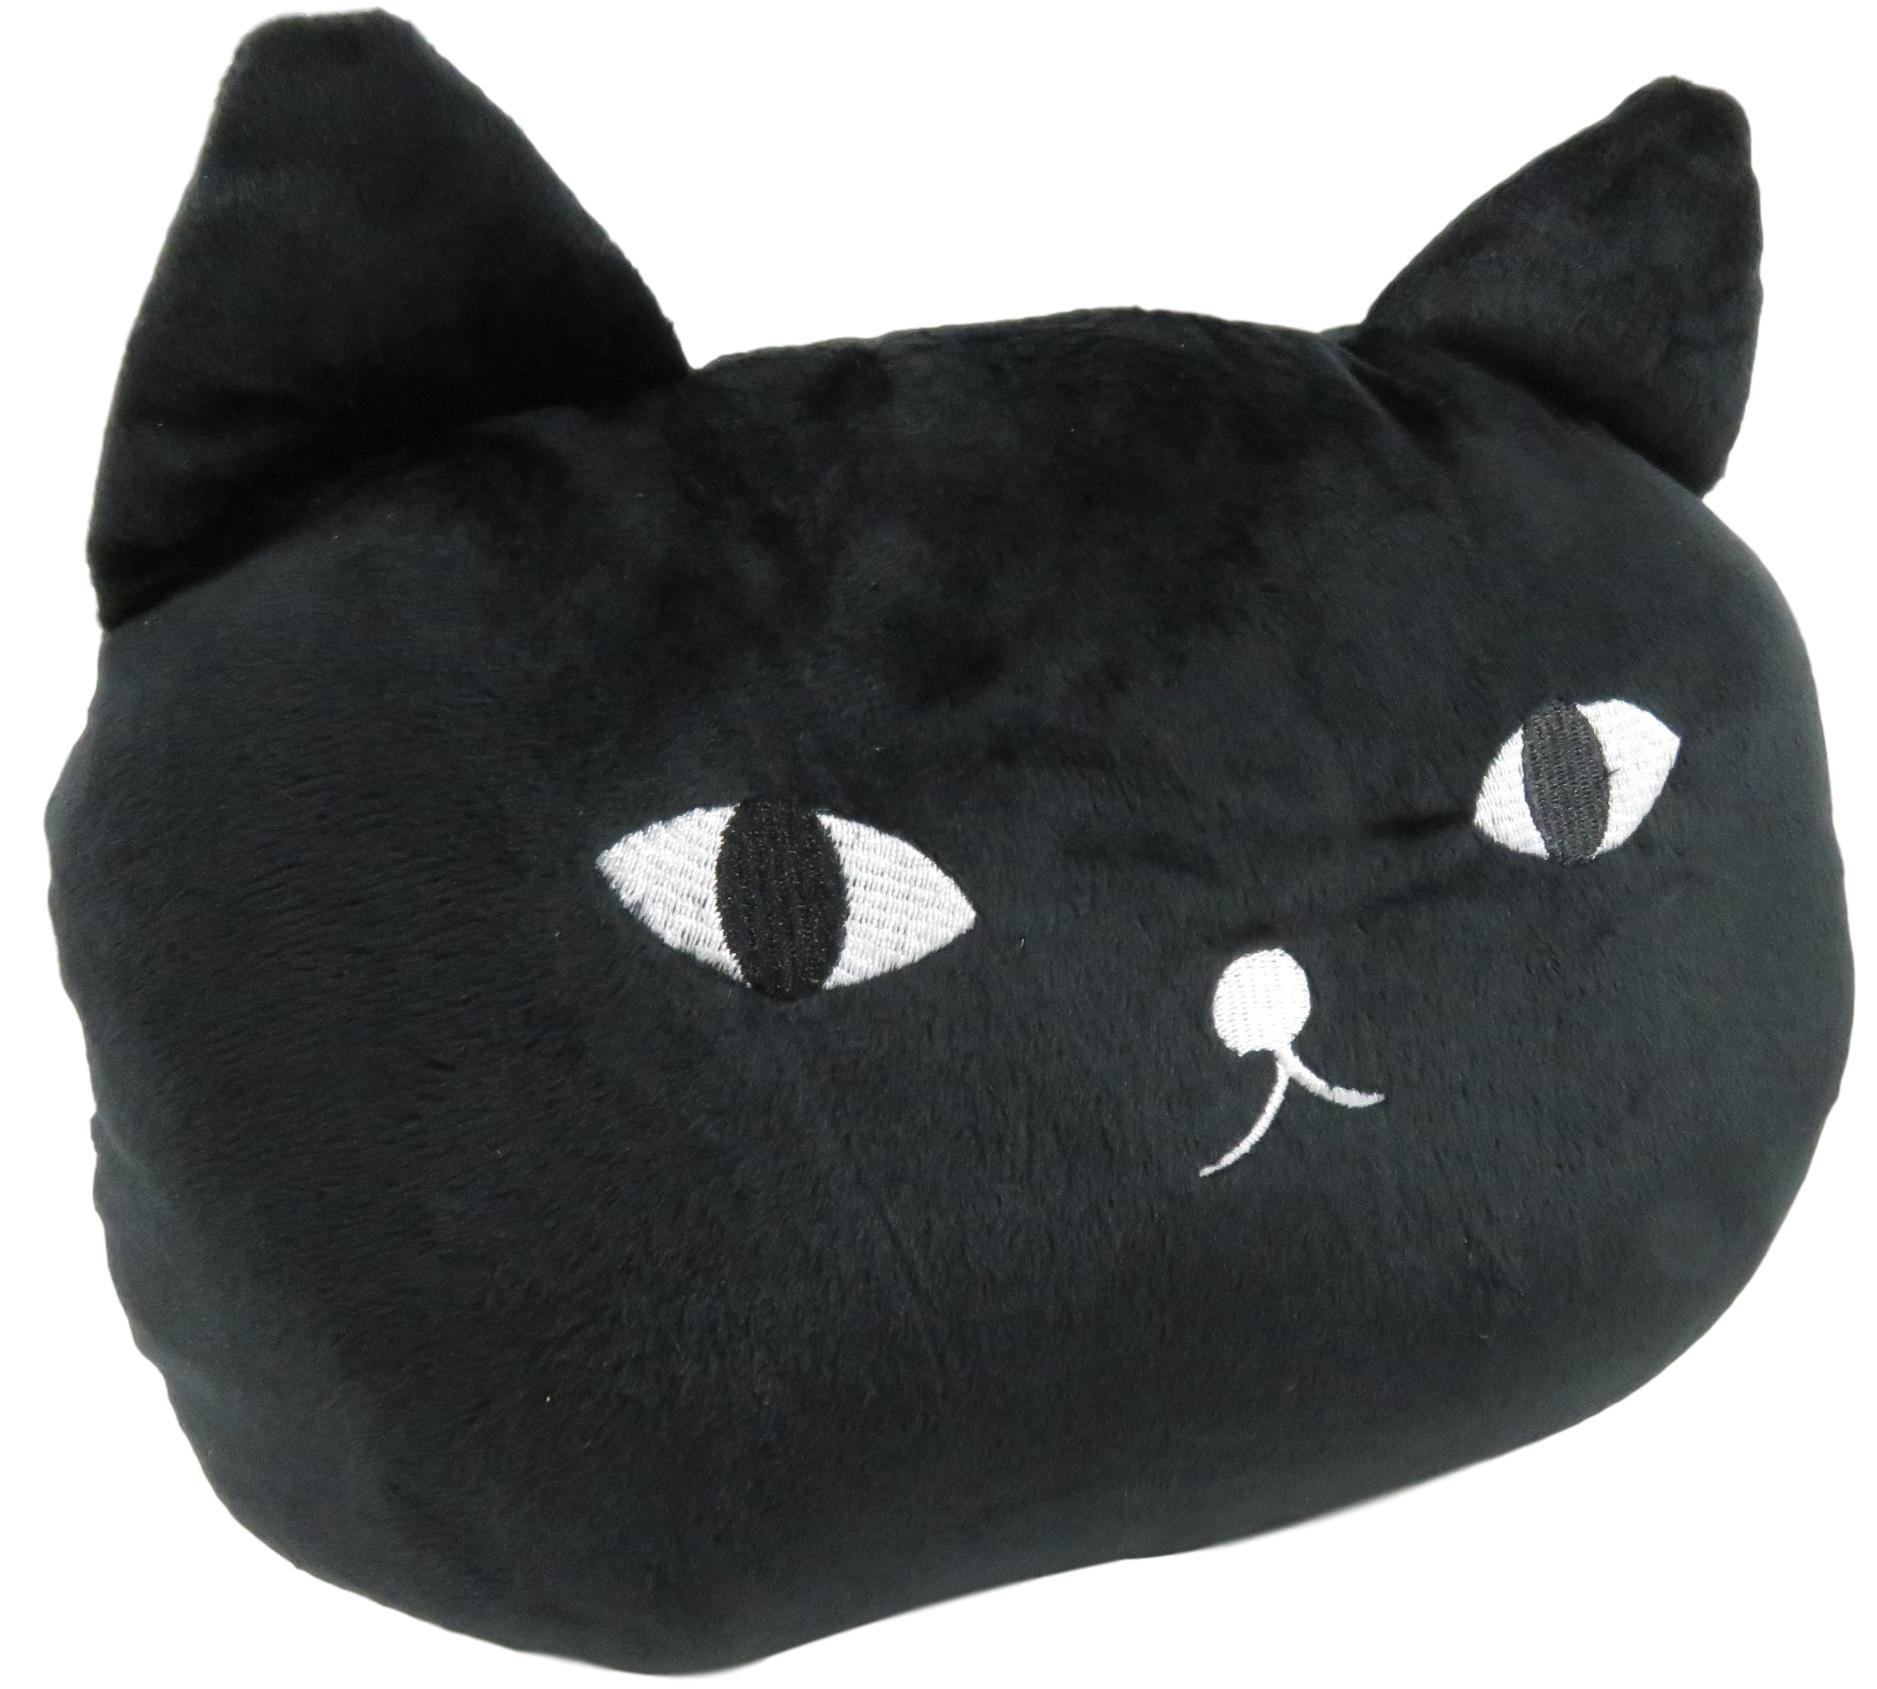 Daiso Adorable Cat Pillow Pad Car Sofa Chair Bed Cushion 10 x 9 Inches Black